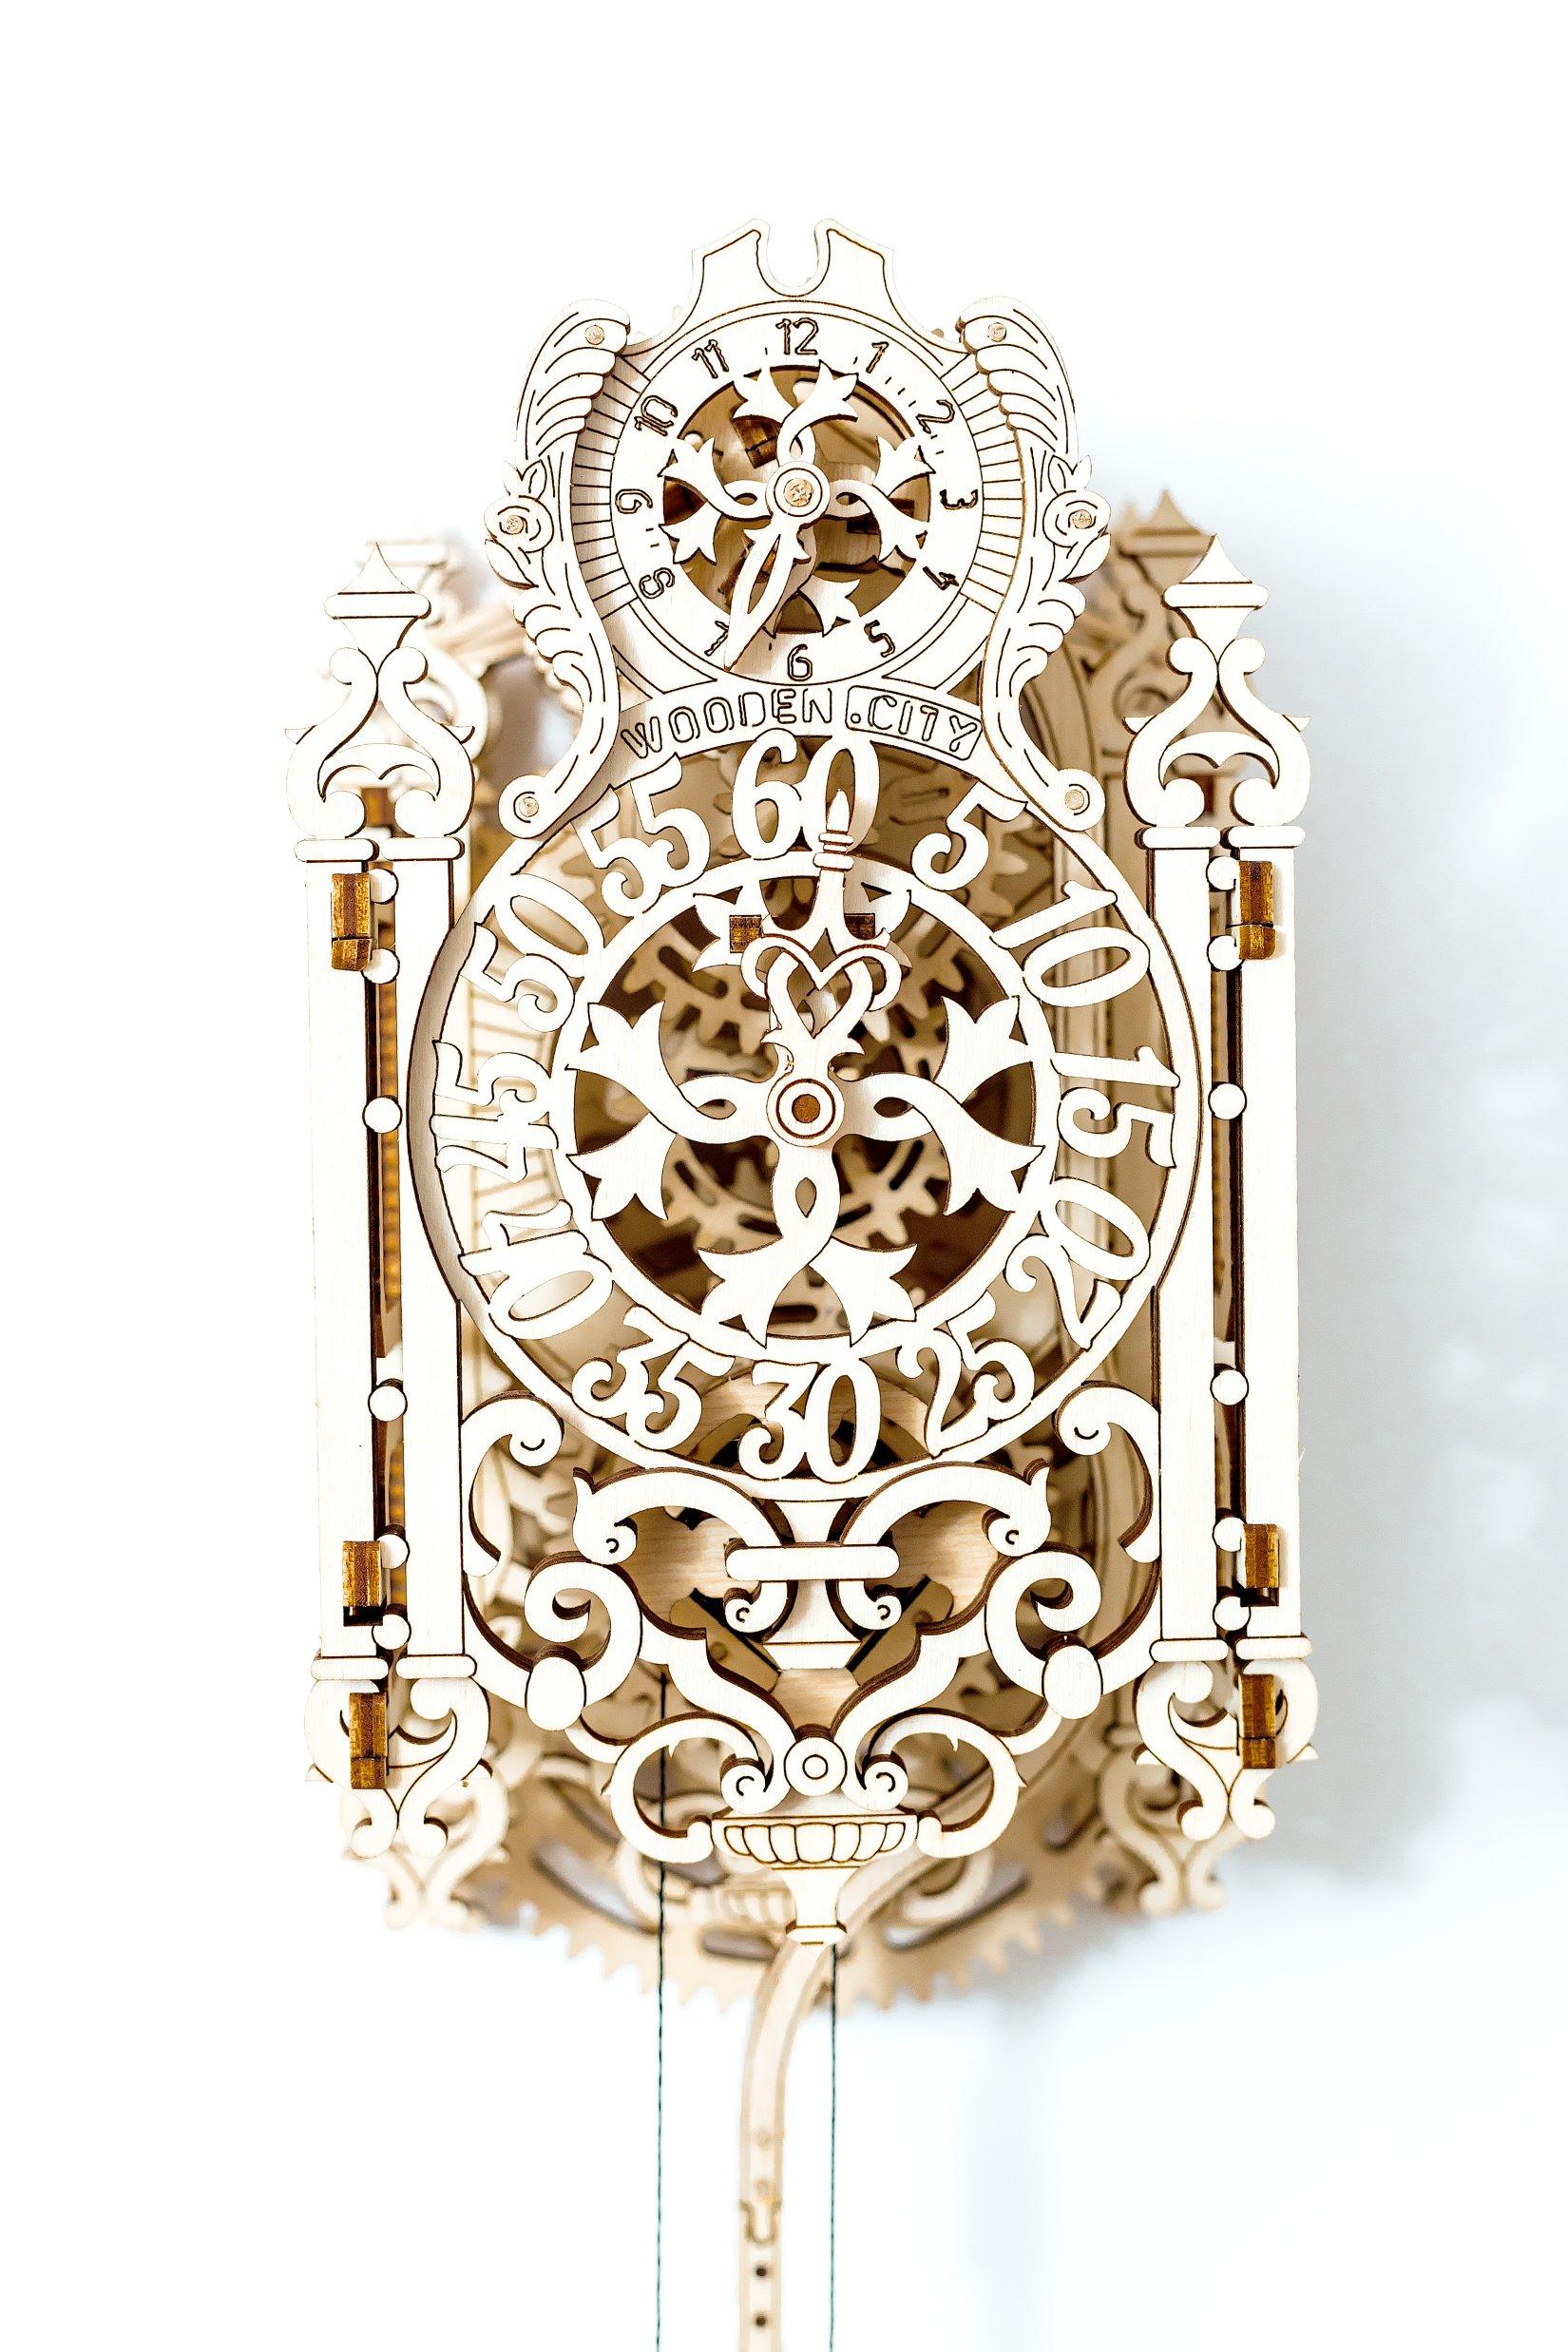 WOODEN CITY Royal Clock, 156 Bauteile